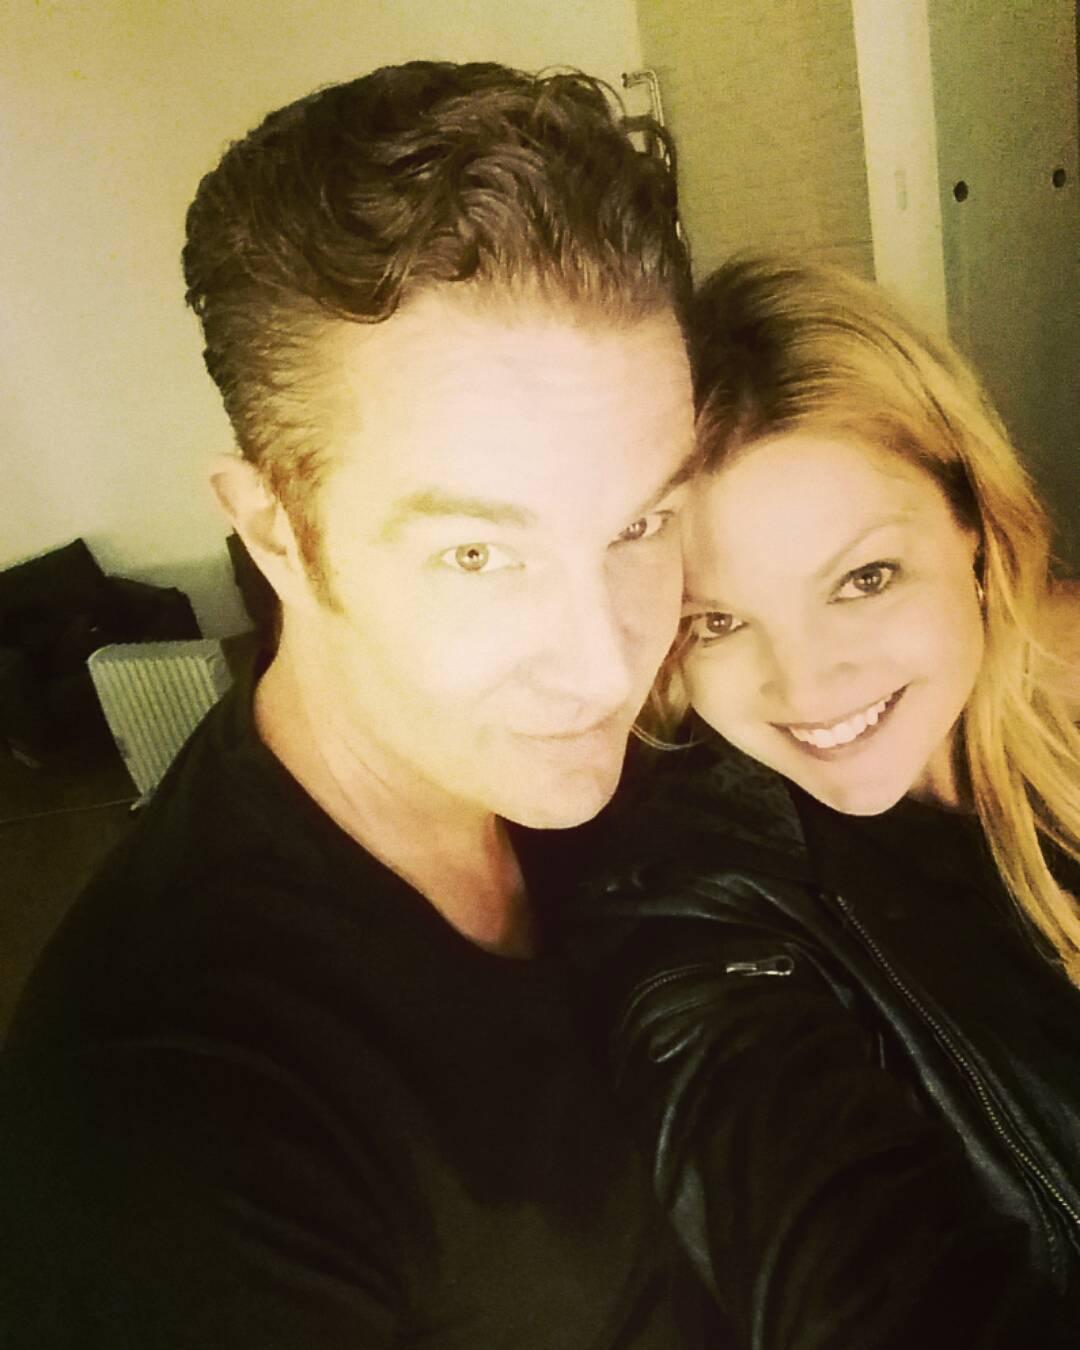 James Marsters & Clare Kramer Buffy Angel FanMeet 2016-01-30